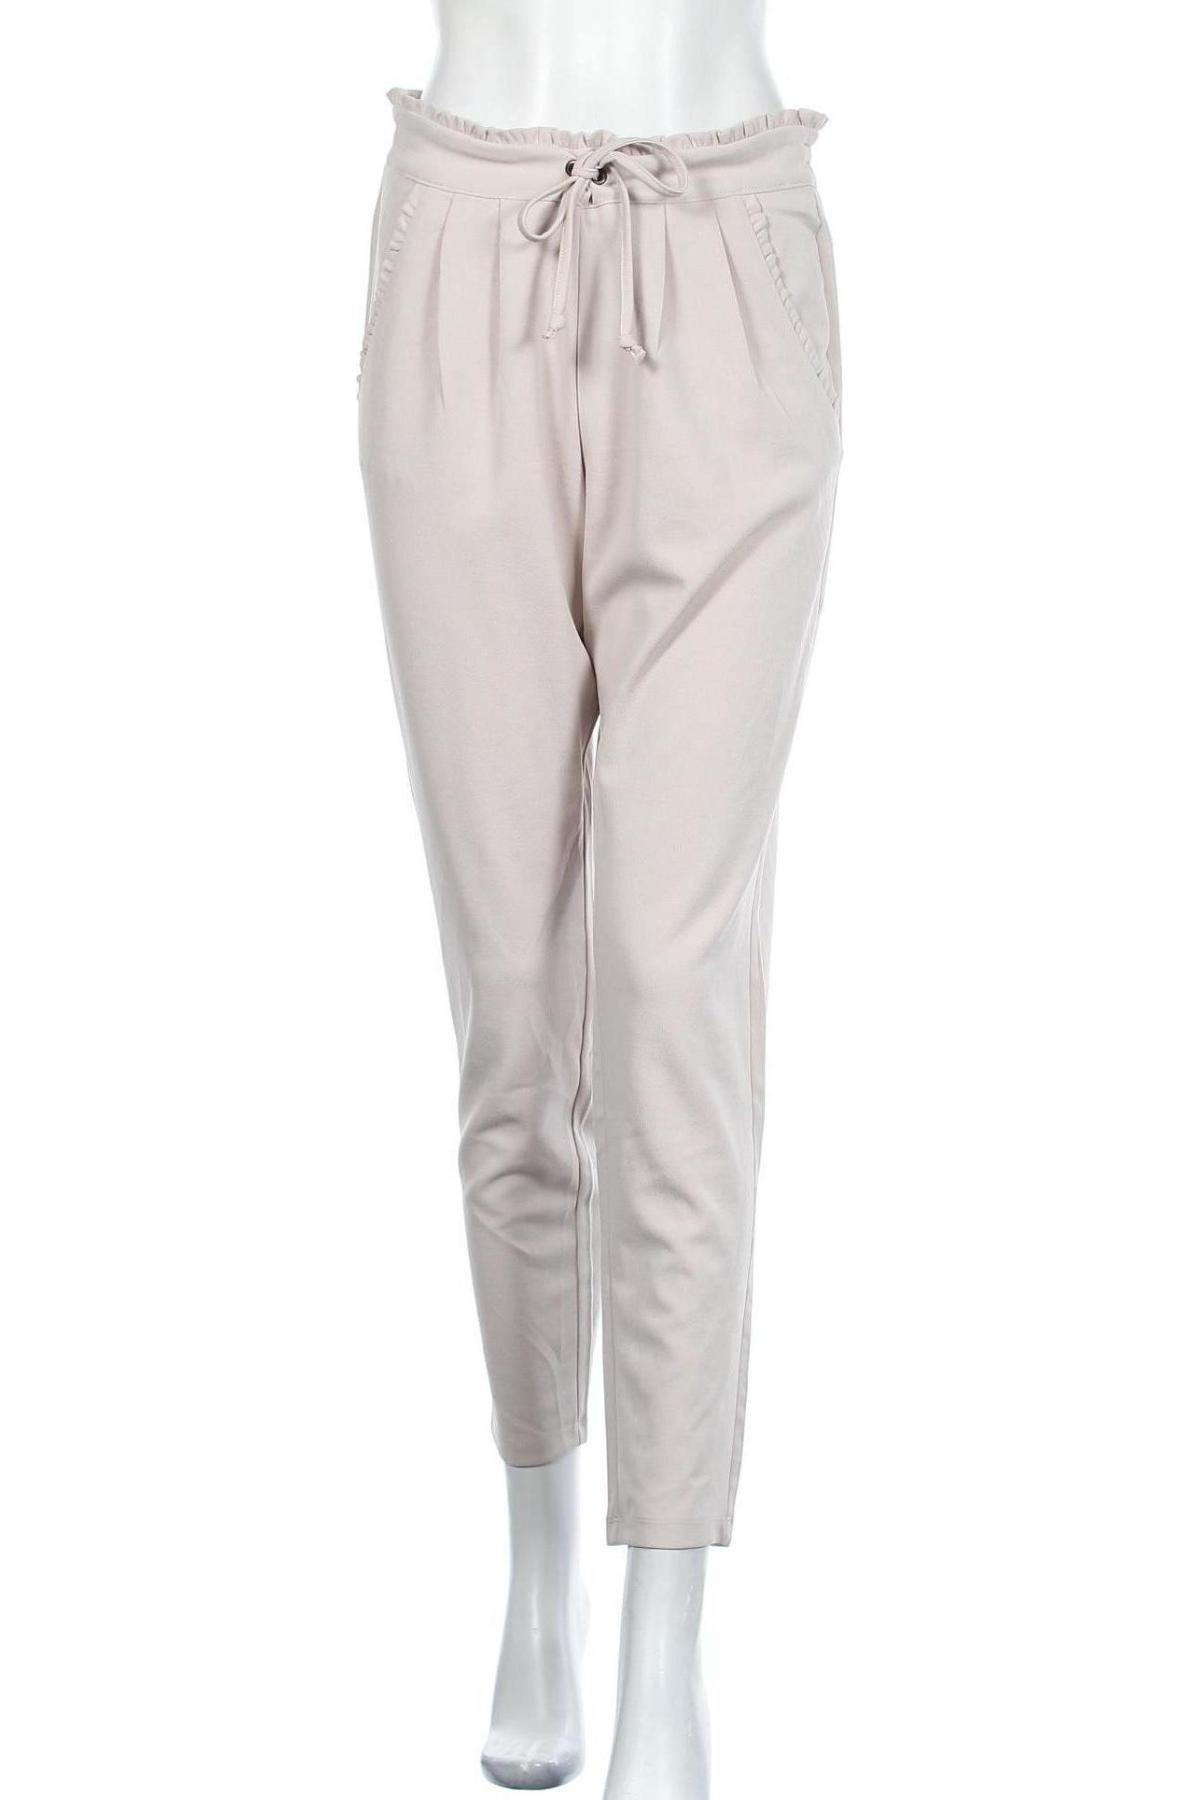 Дамски панталон Jacqueline De Yong, Размер M, Цвят Бежов, 95% полиестер, 5% еластан, Цена 12,34лв.